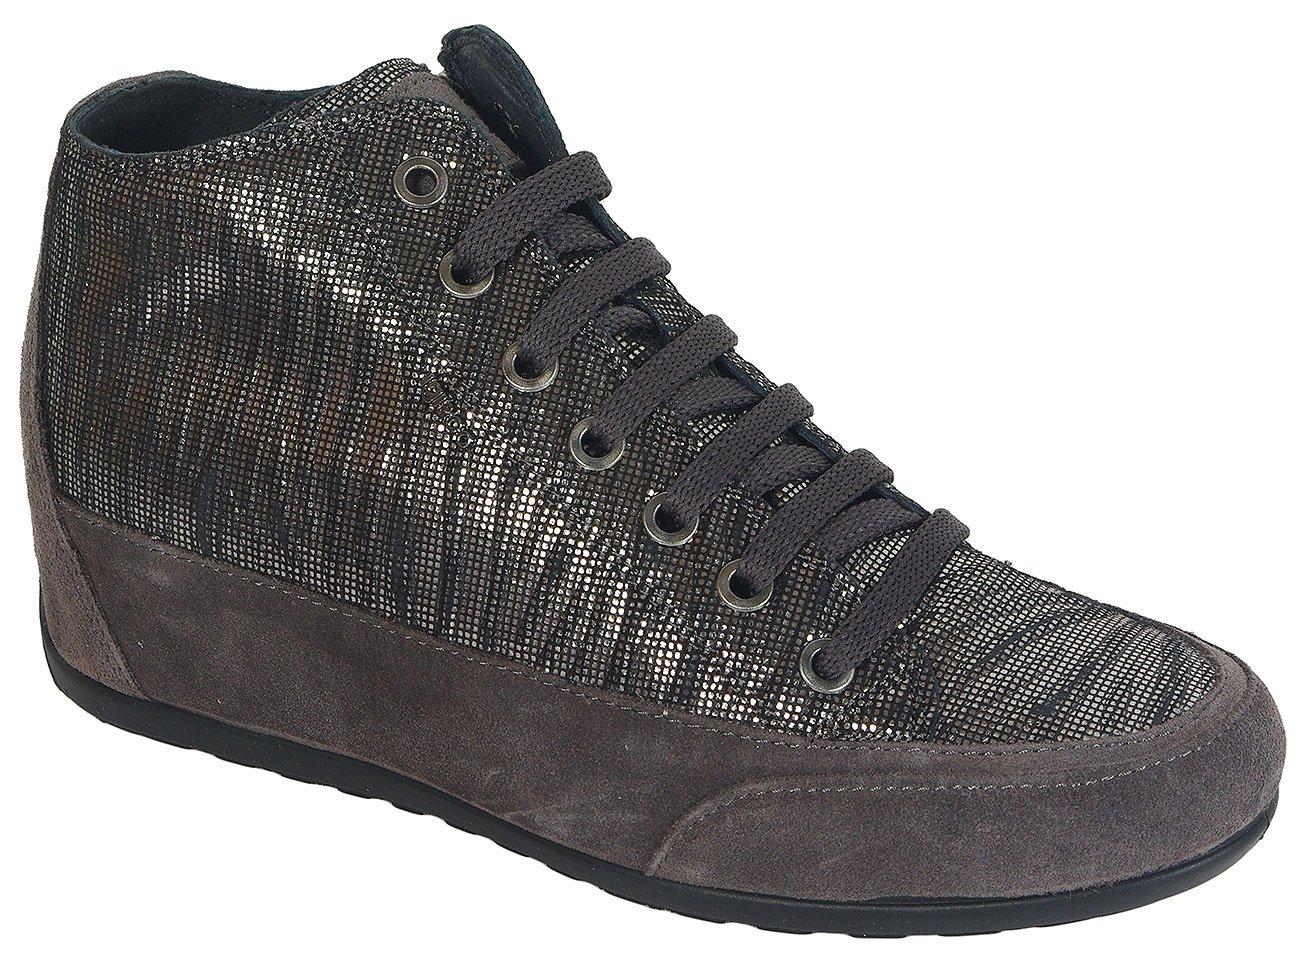 igi&co 8785 Scam./Capr. Nani Grigio sneakers